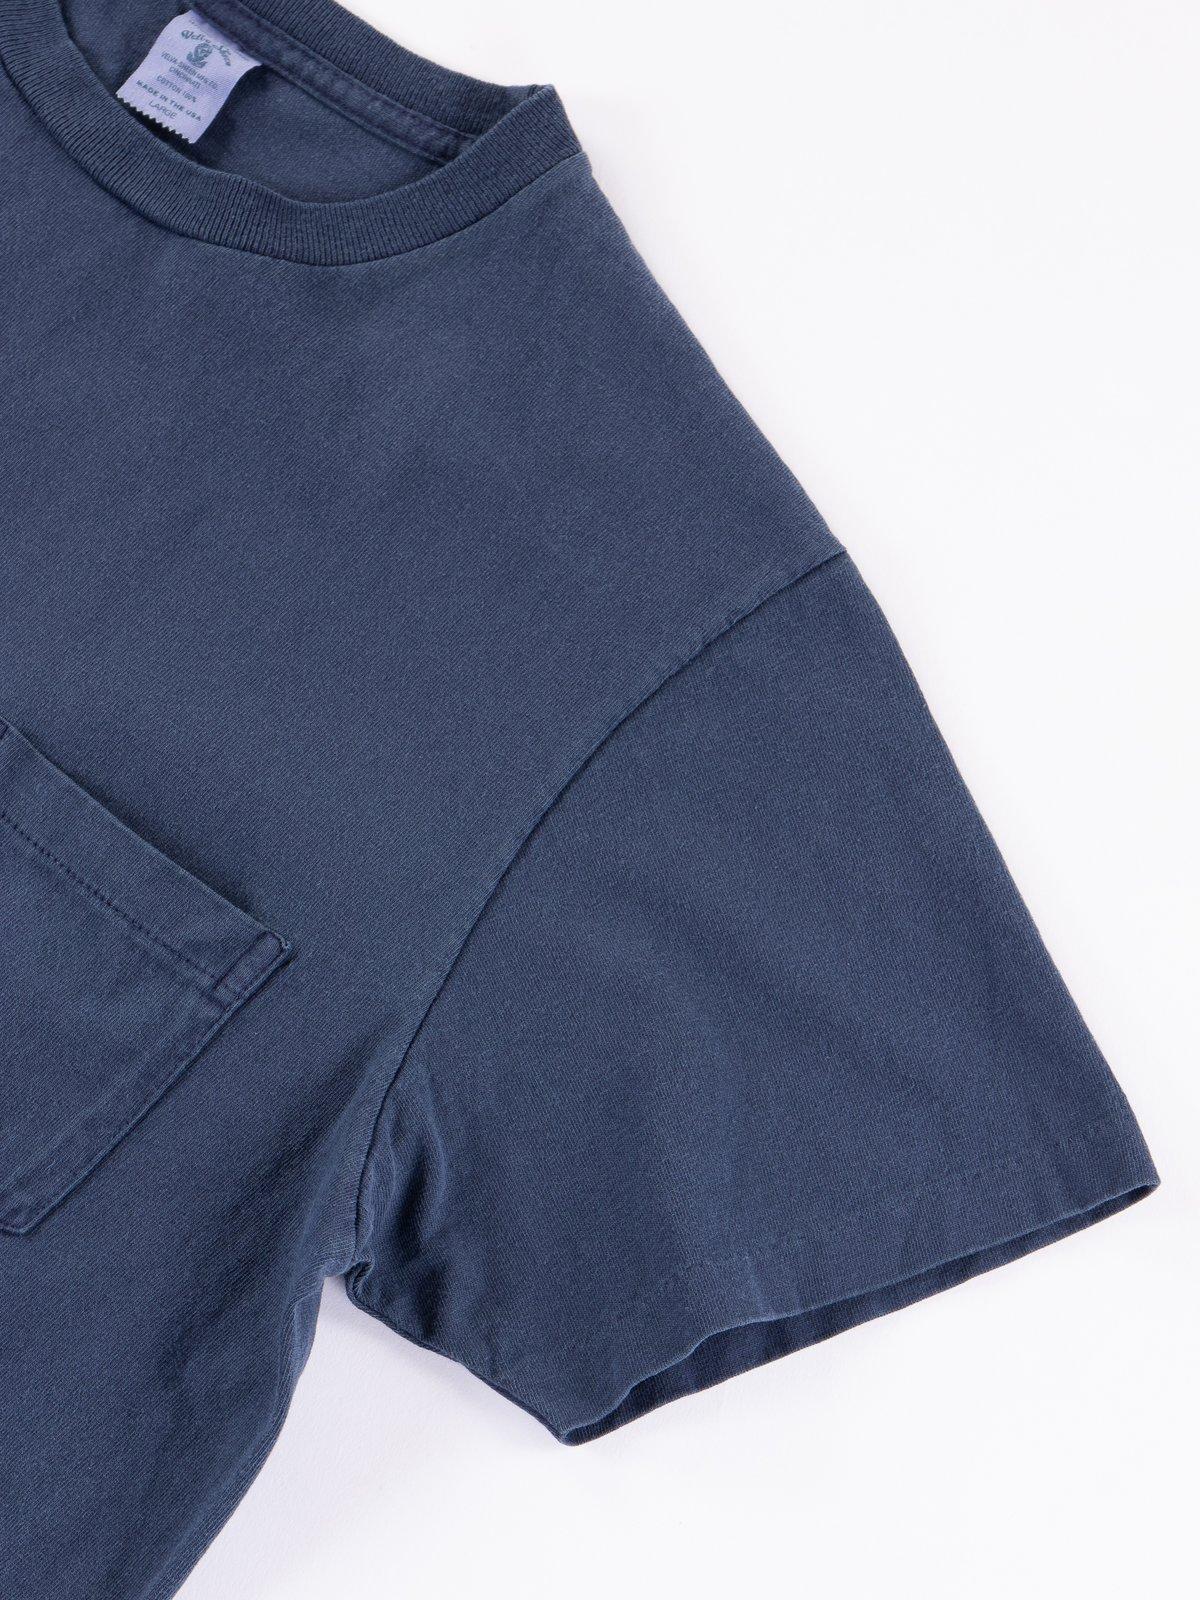 Navy Pigment Dye Pocket Tee - Image 4